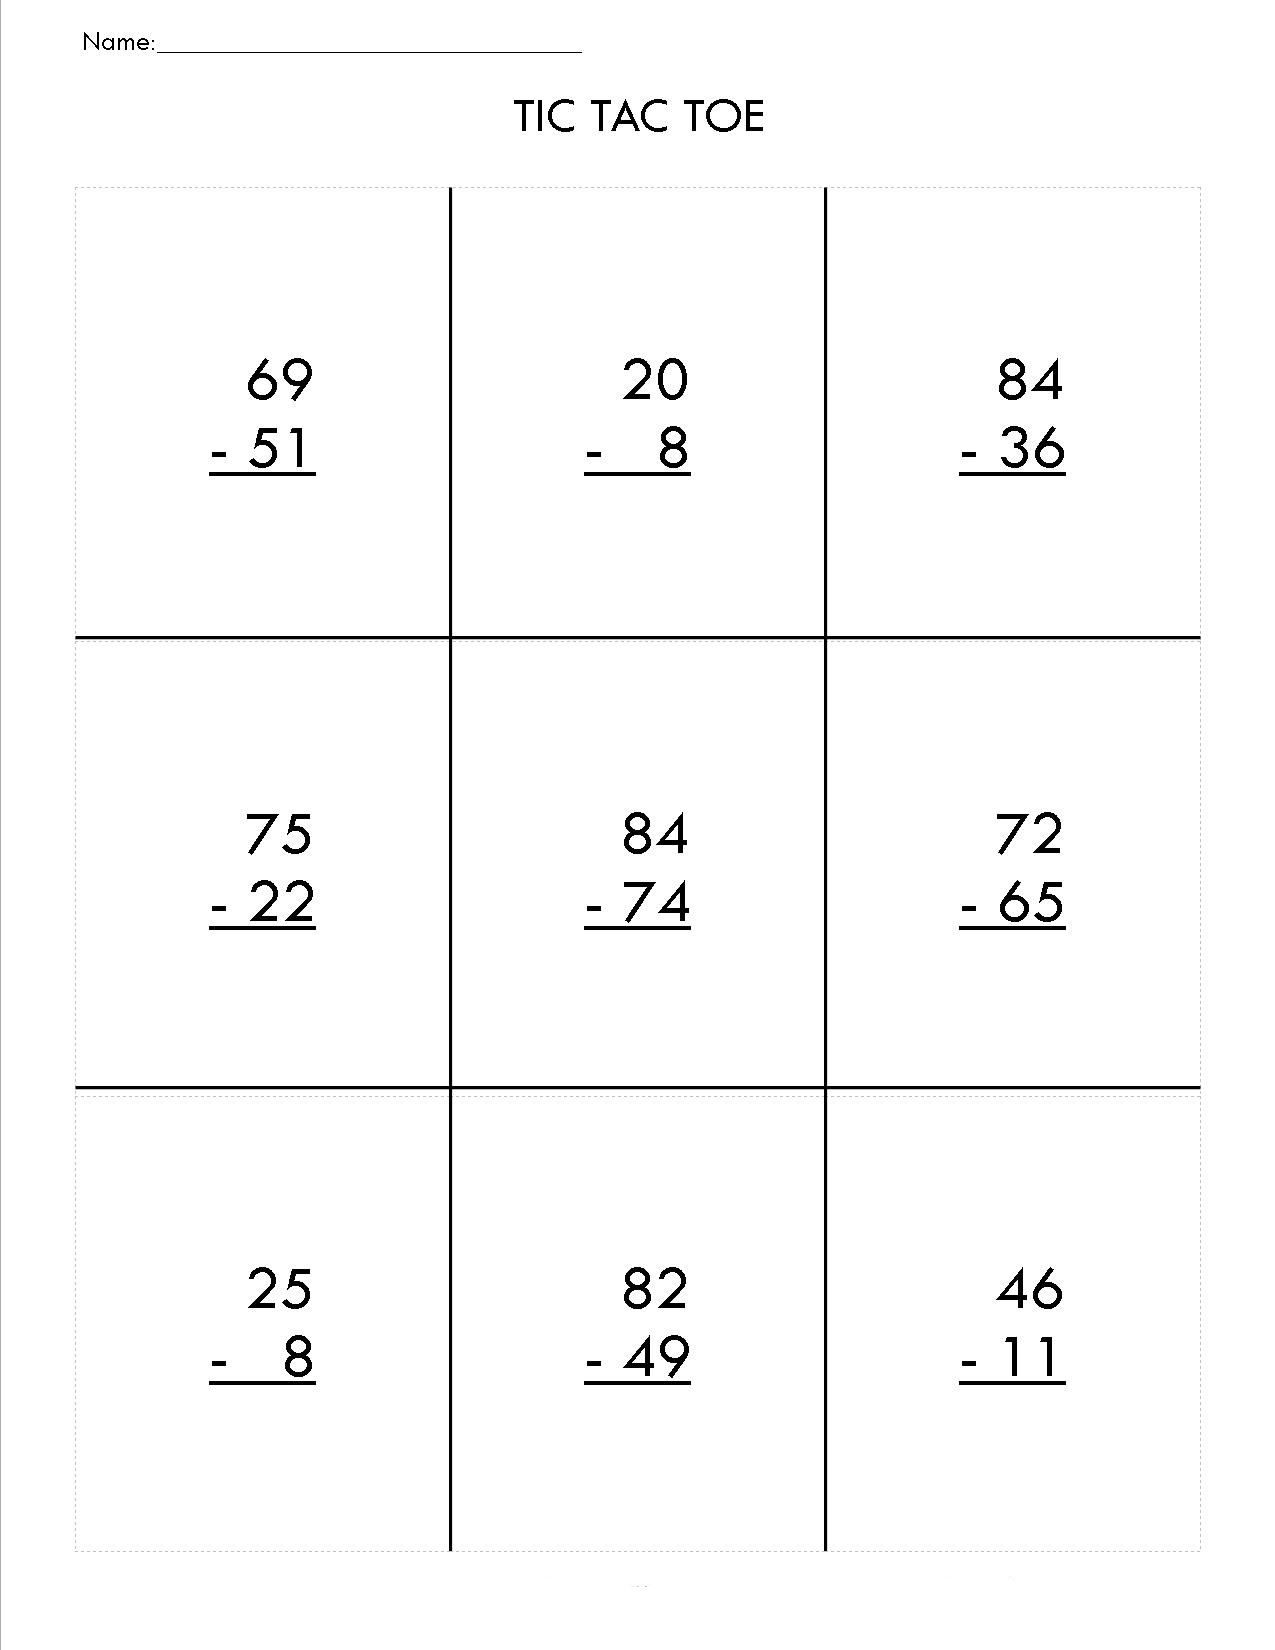 2nd Grade Math Worksheets Printable Second Grade Math Worksheets To Free Down 2nd Grade Math Worksheets Third Grade Math Worksheets First Grade Math Worksheets